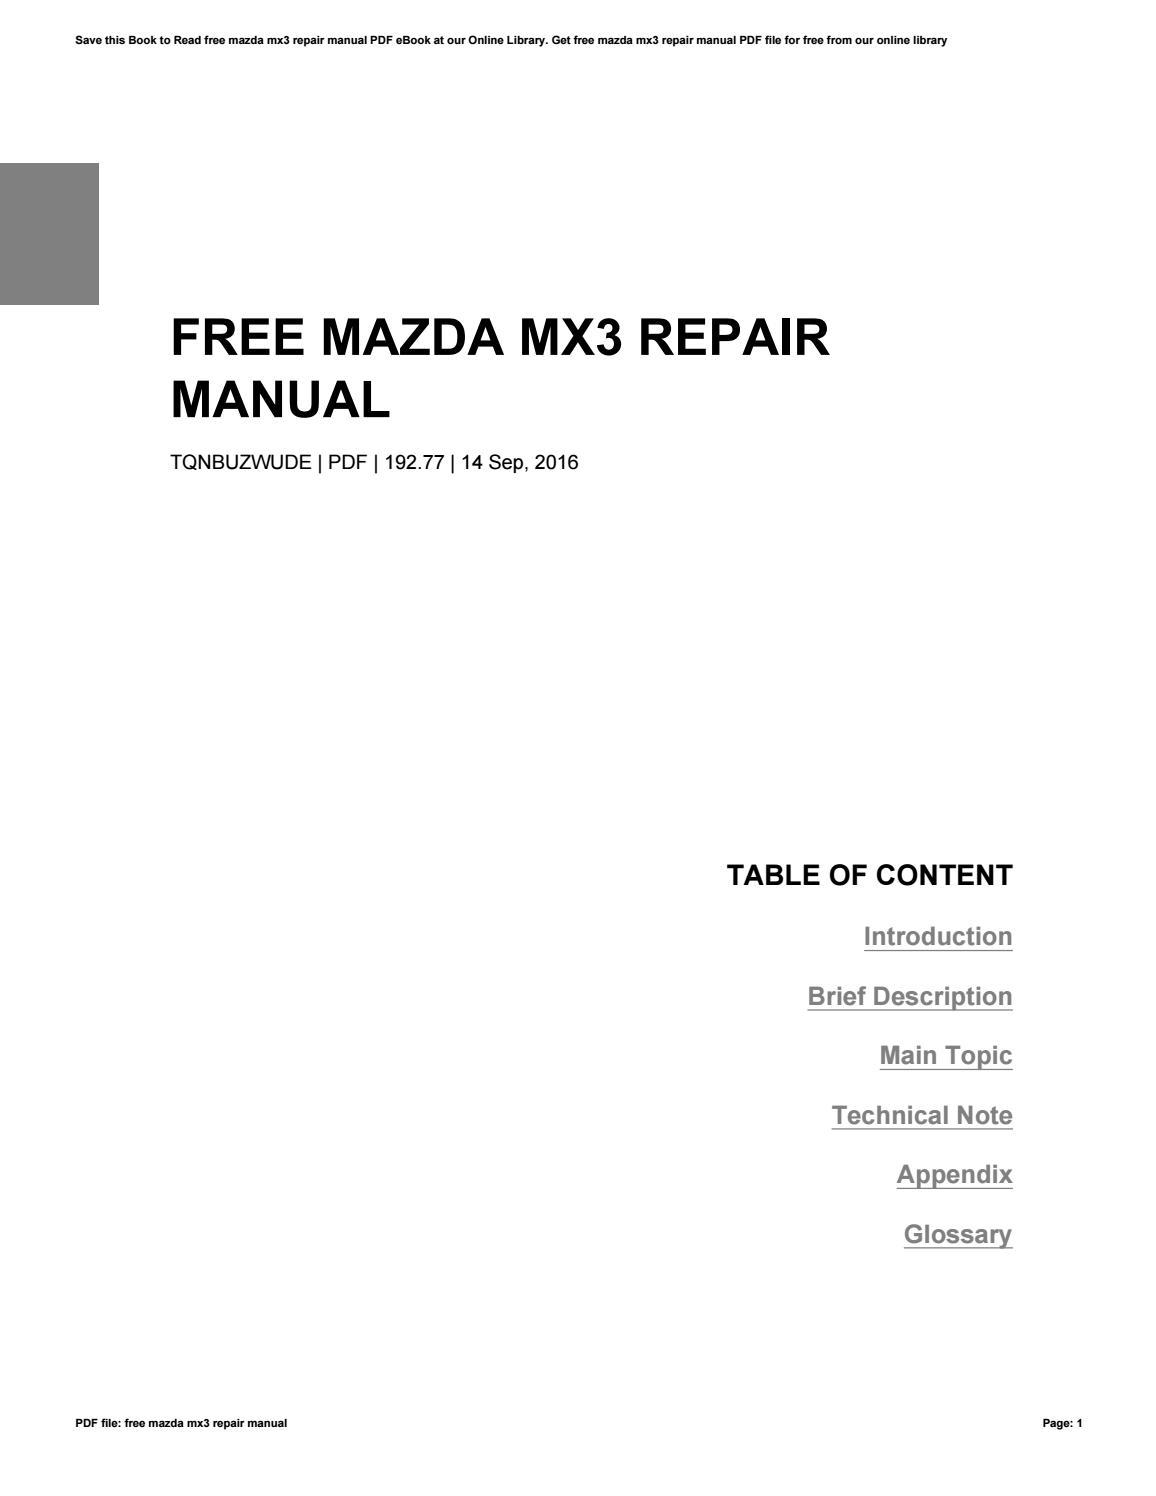 Array - free mazda mx3 repair manual by yvonnechavez3948 issuu rh issuu .